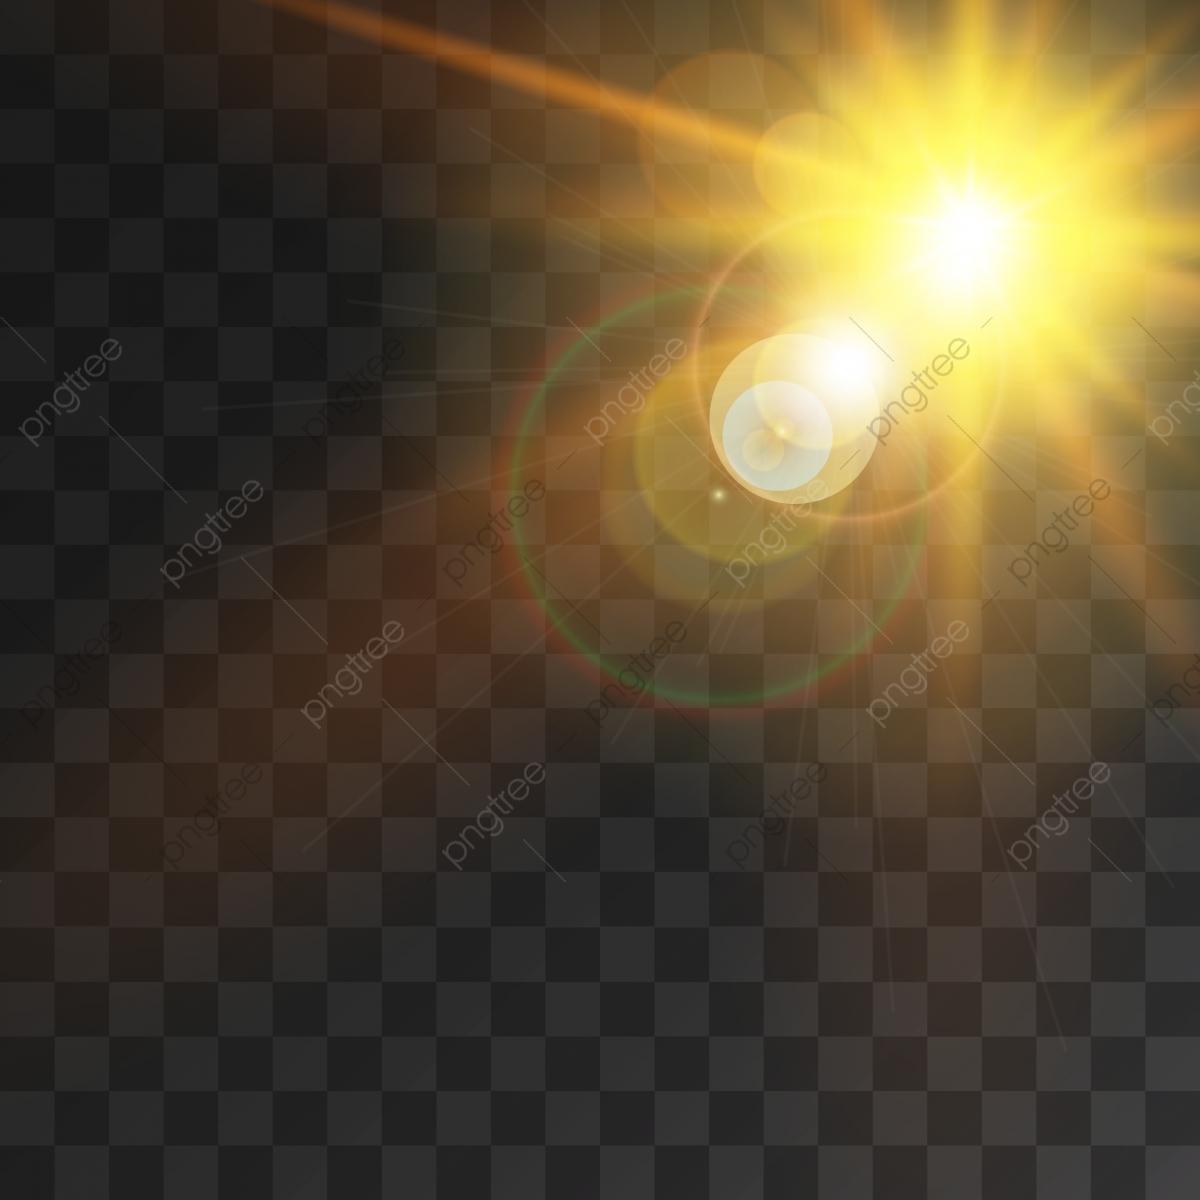 Creative Sun Light Effect With Sun Rays And Bokeh.